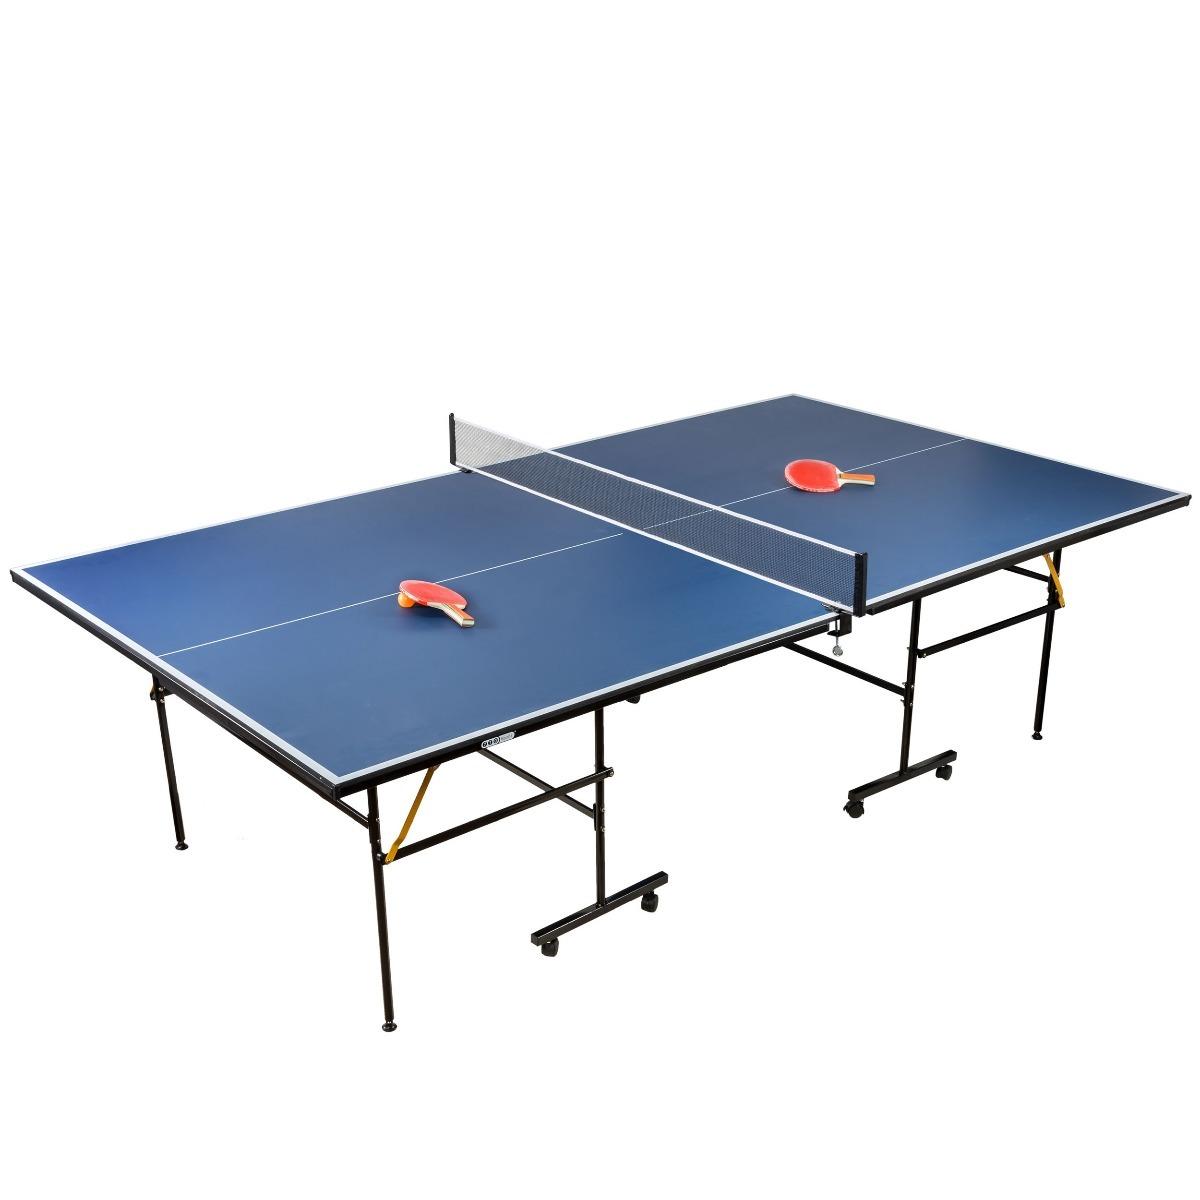 5da8349c6 Mesa Ping Pong Profesional Plegable Tenis De Mesa (video) -   8.199 ...